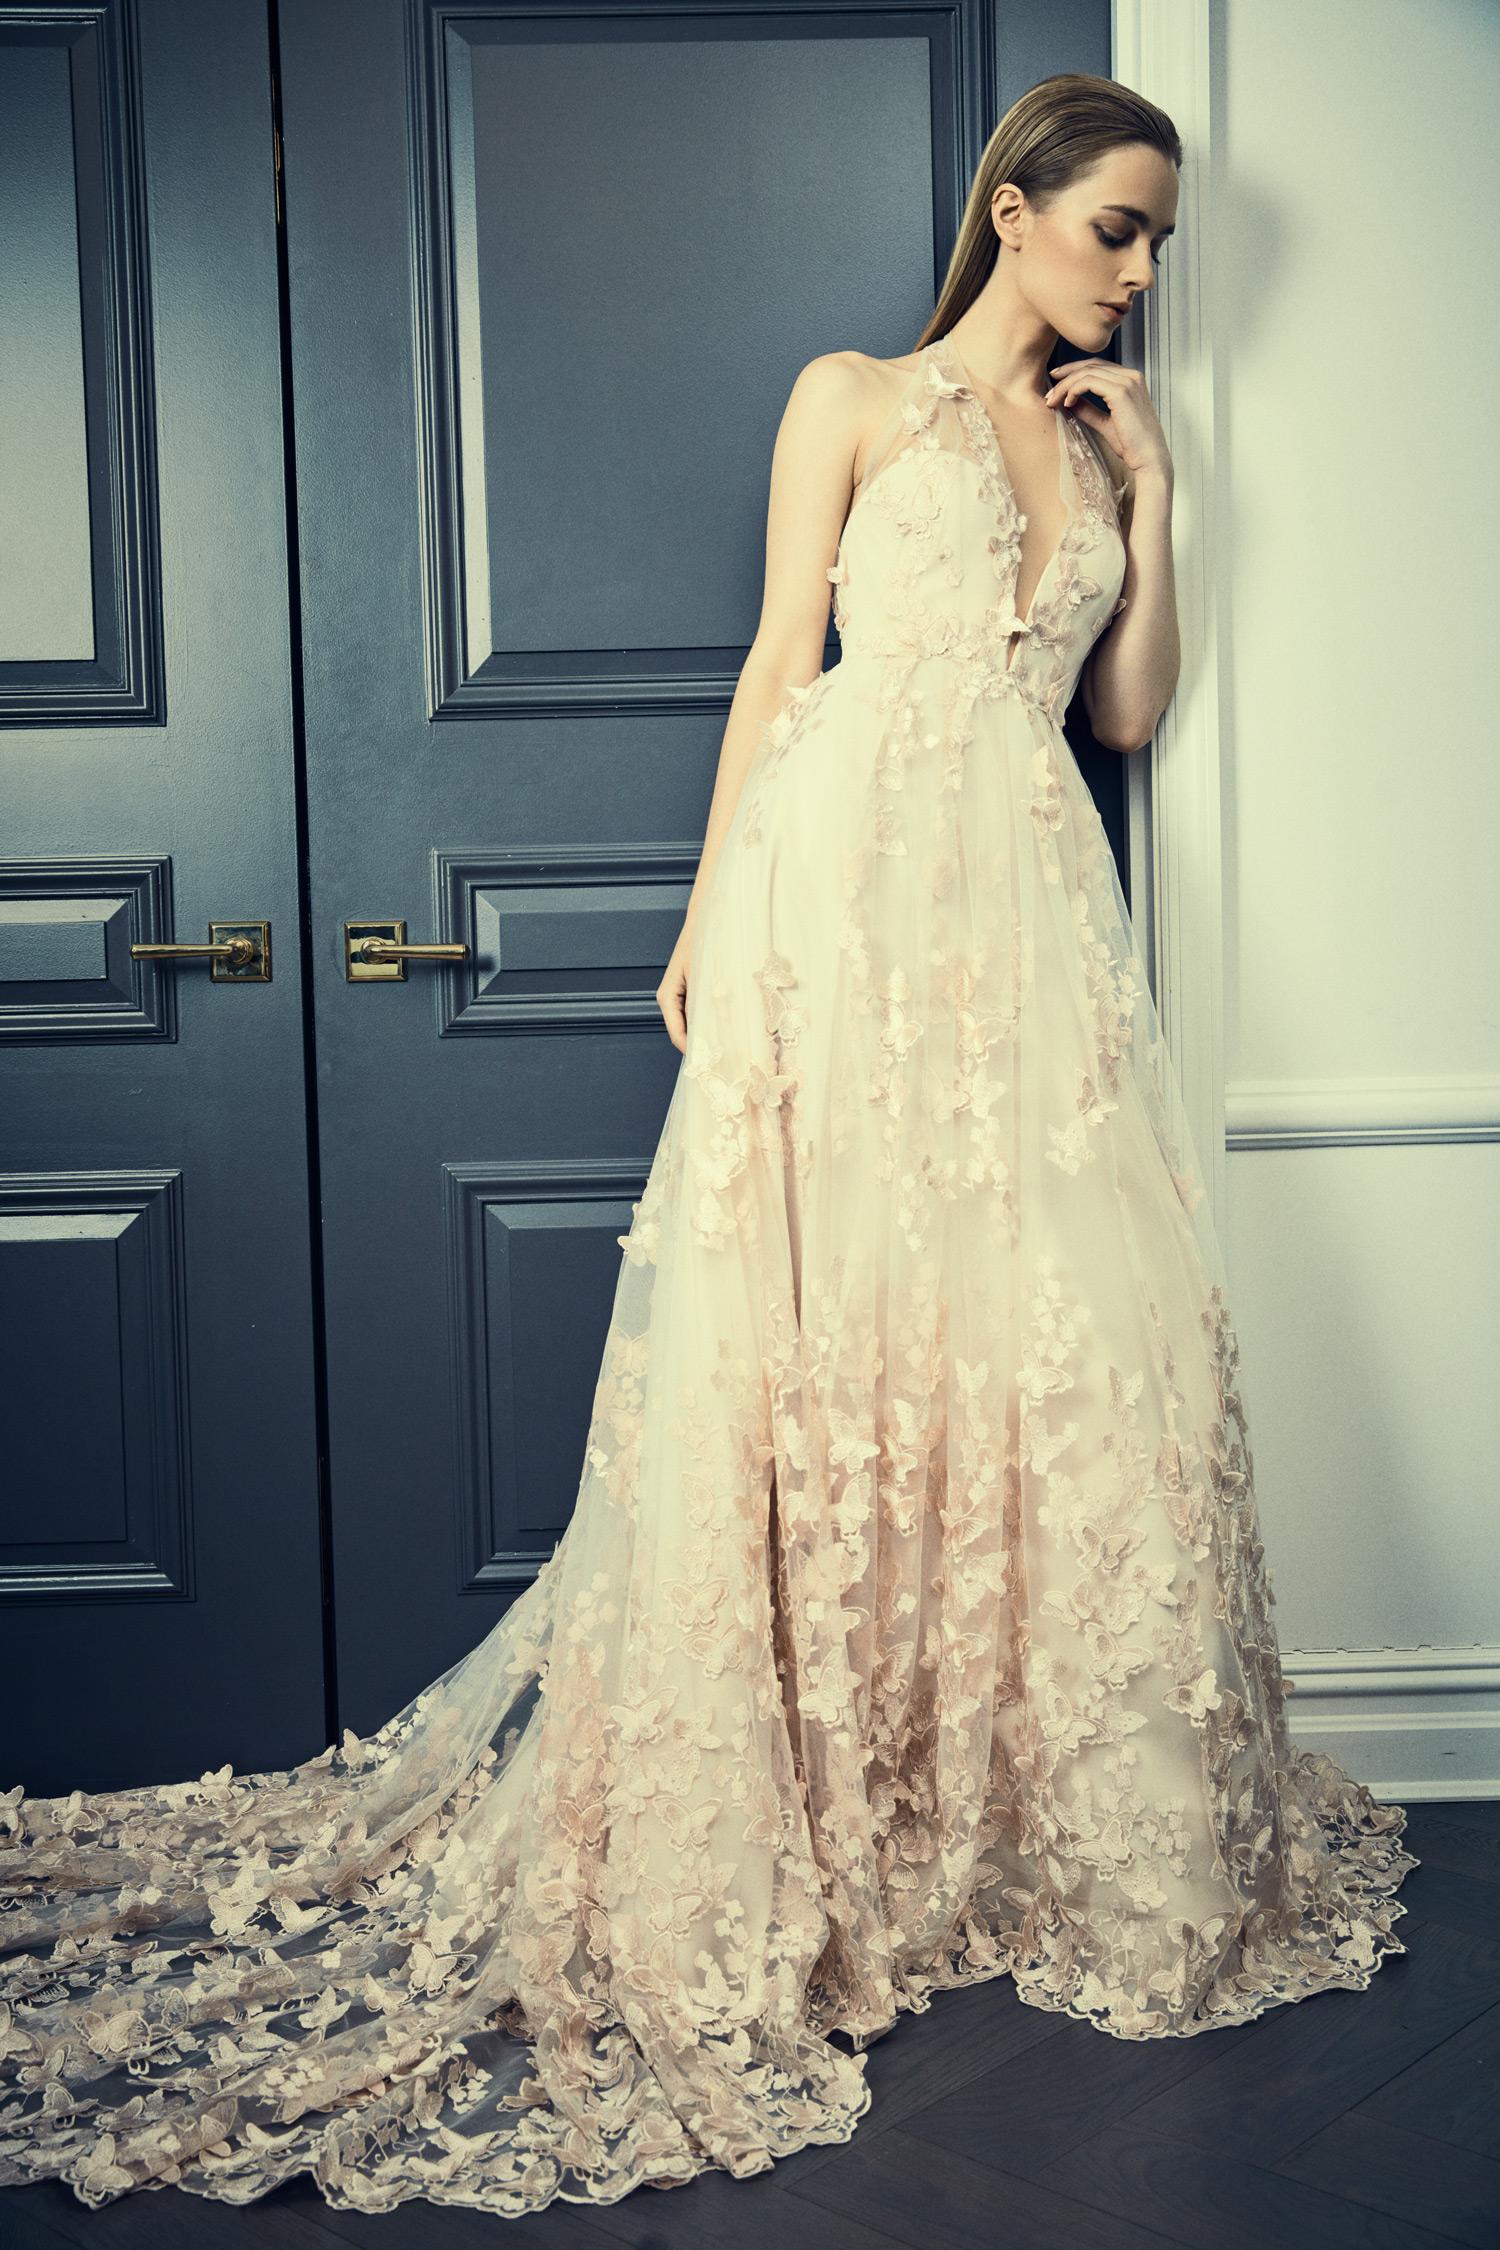 romona keveza collection wedding dress spring 2018 v-neck lace